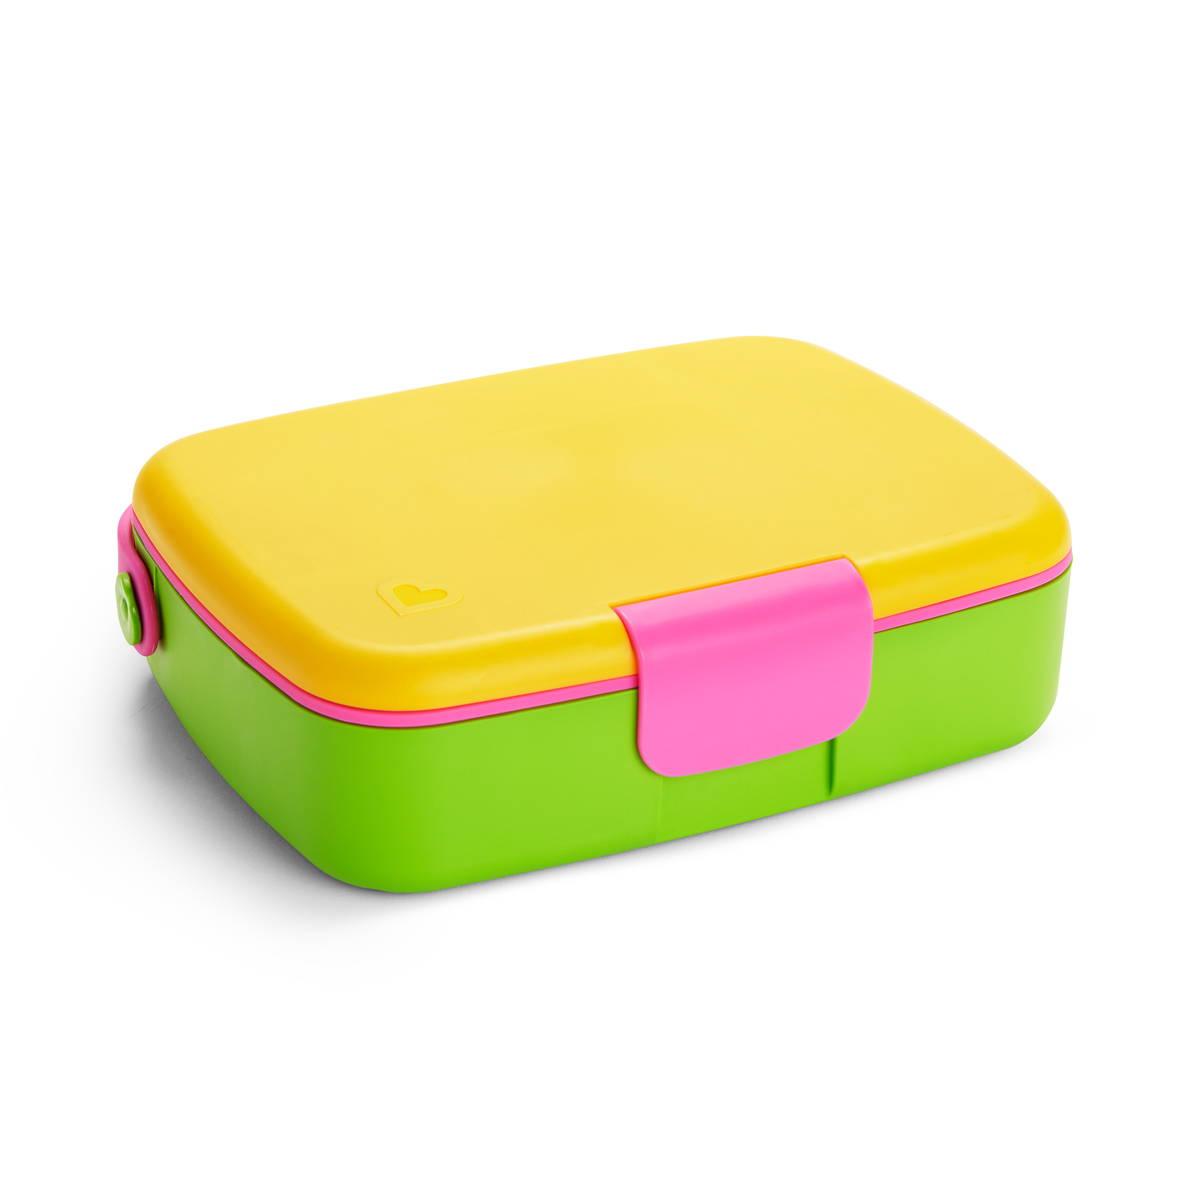 Lunch bento box yellow/pink Munchkin